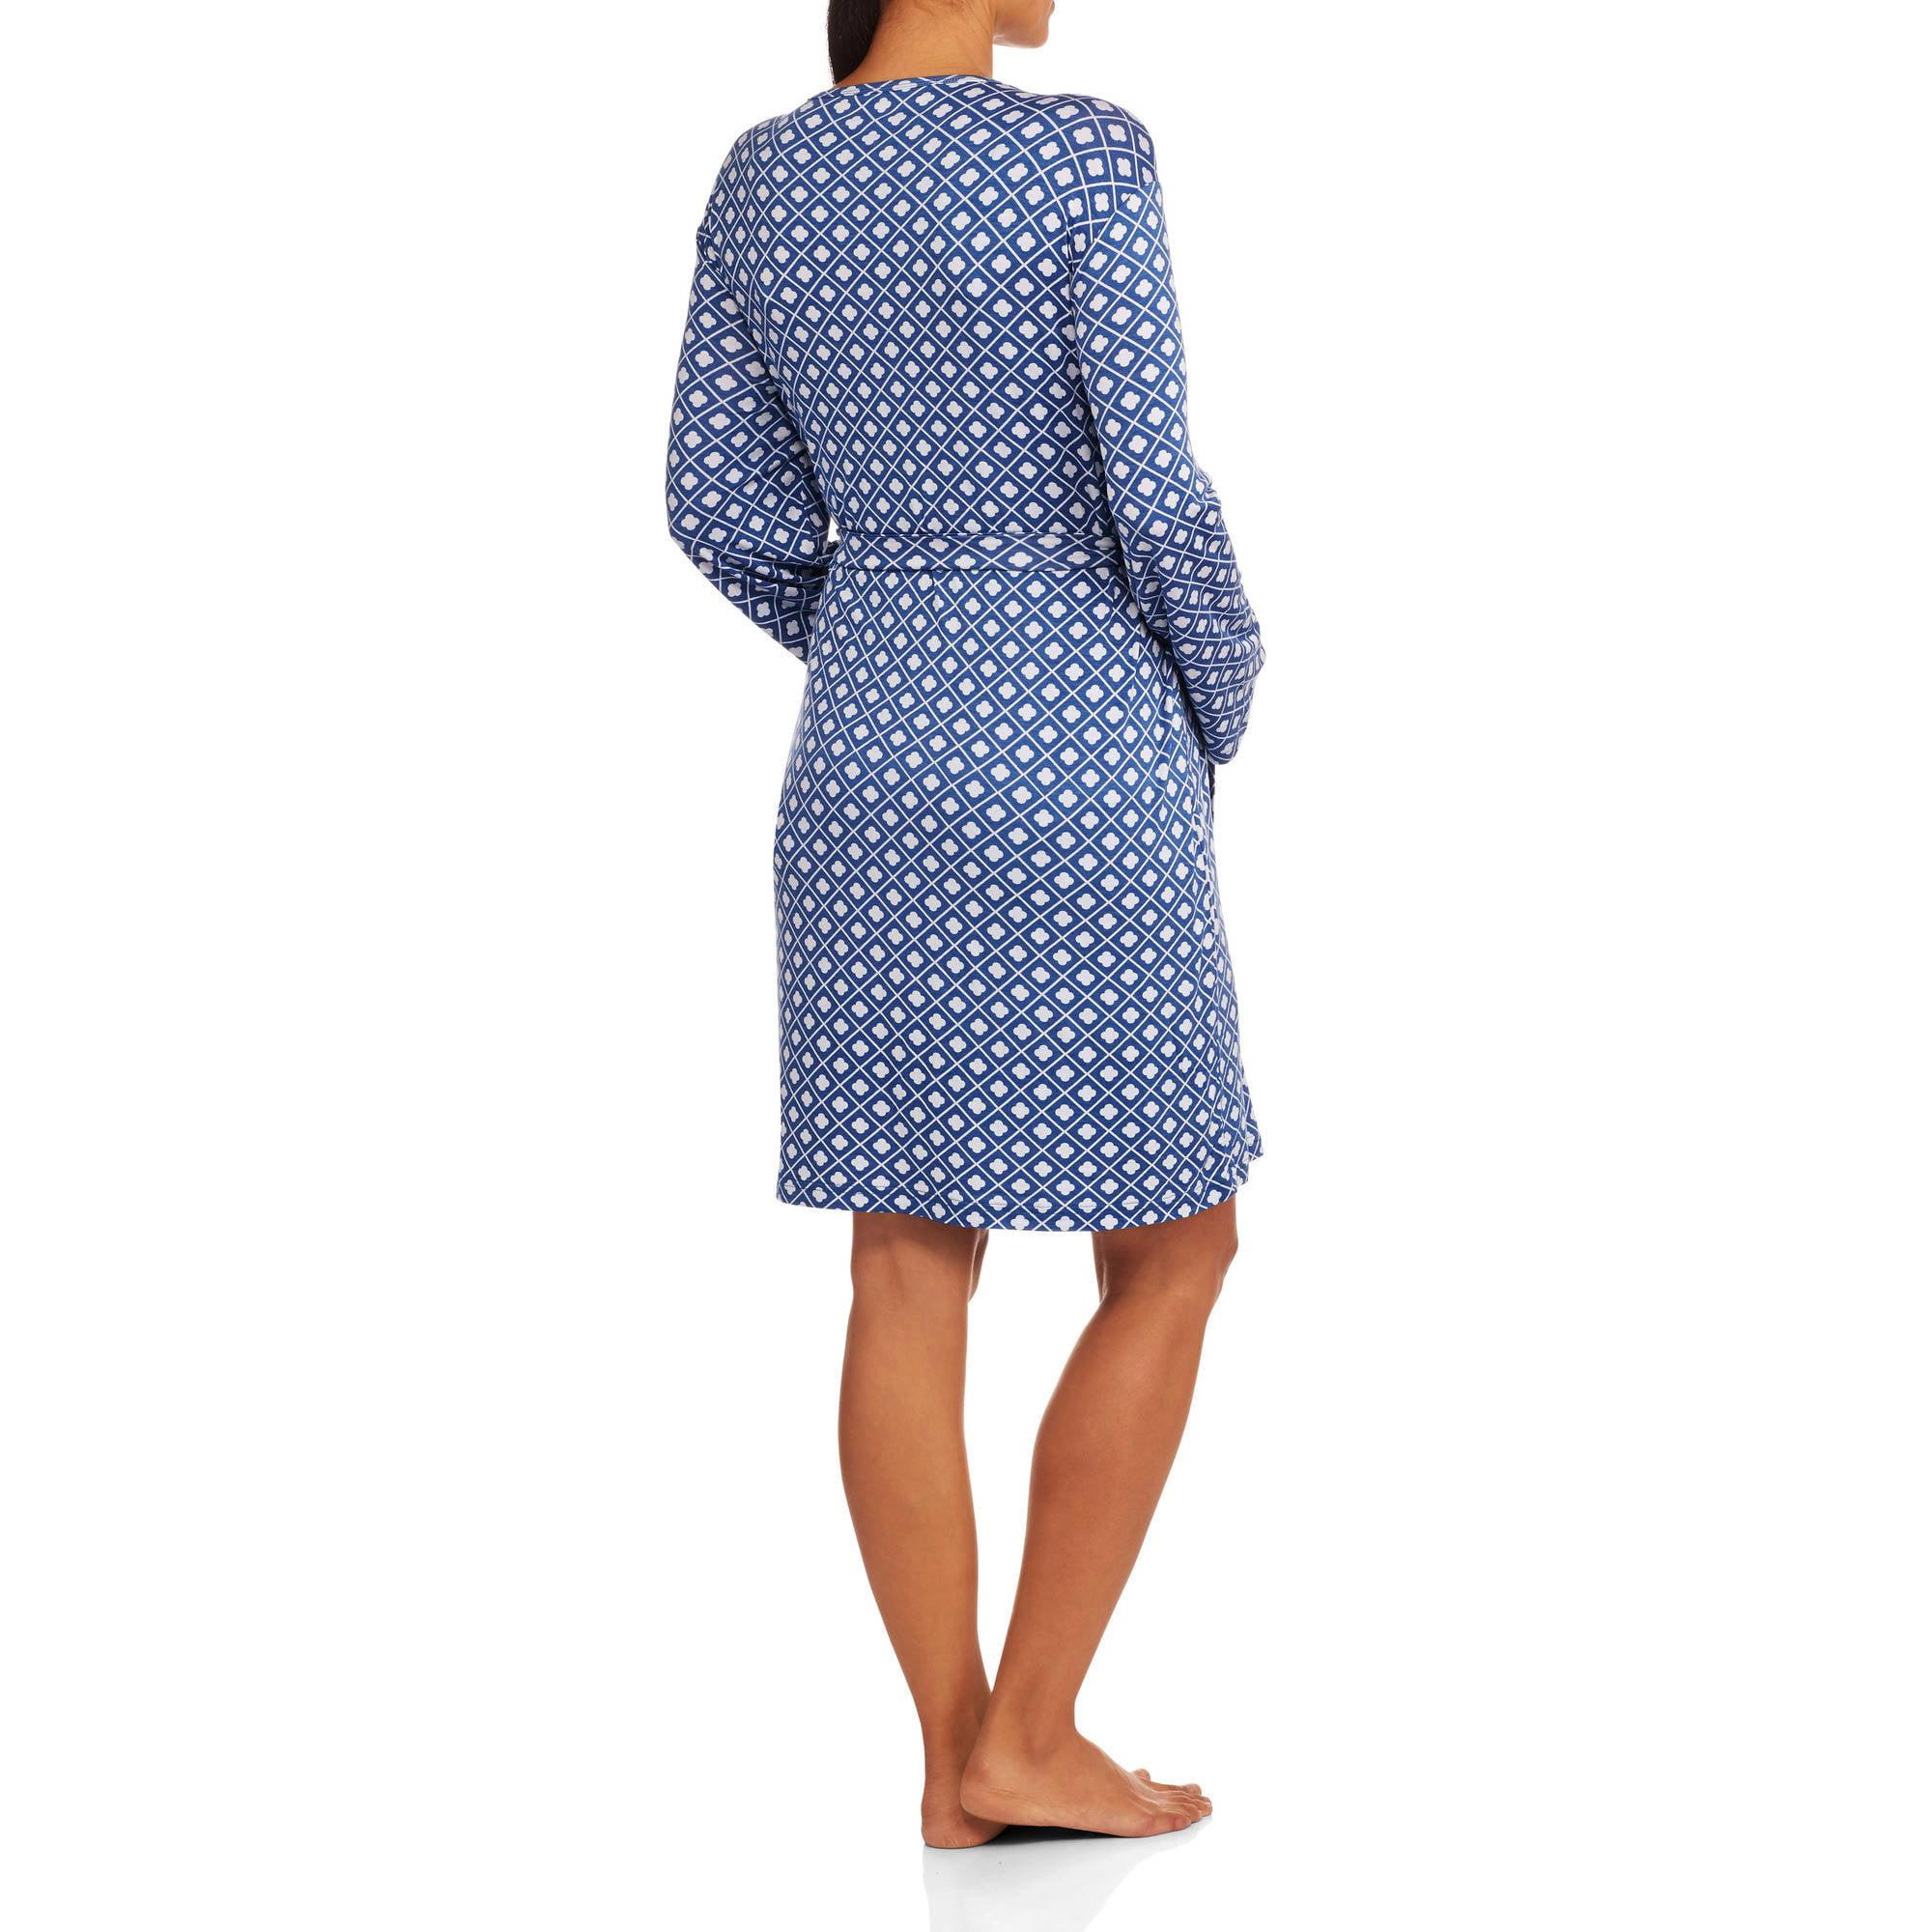 Maternity 2-Piece Nursing Chemise and Robe Set - Walmart.com